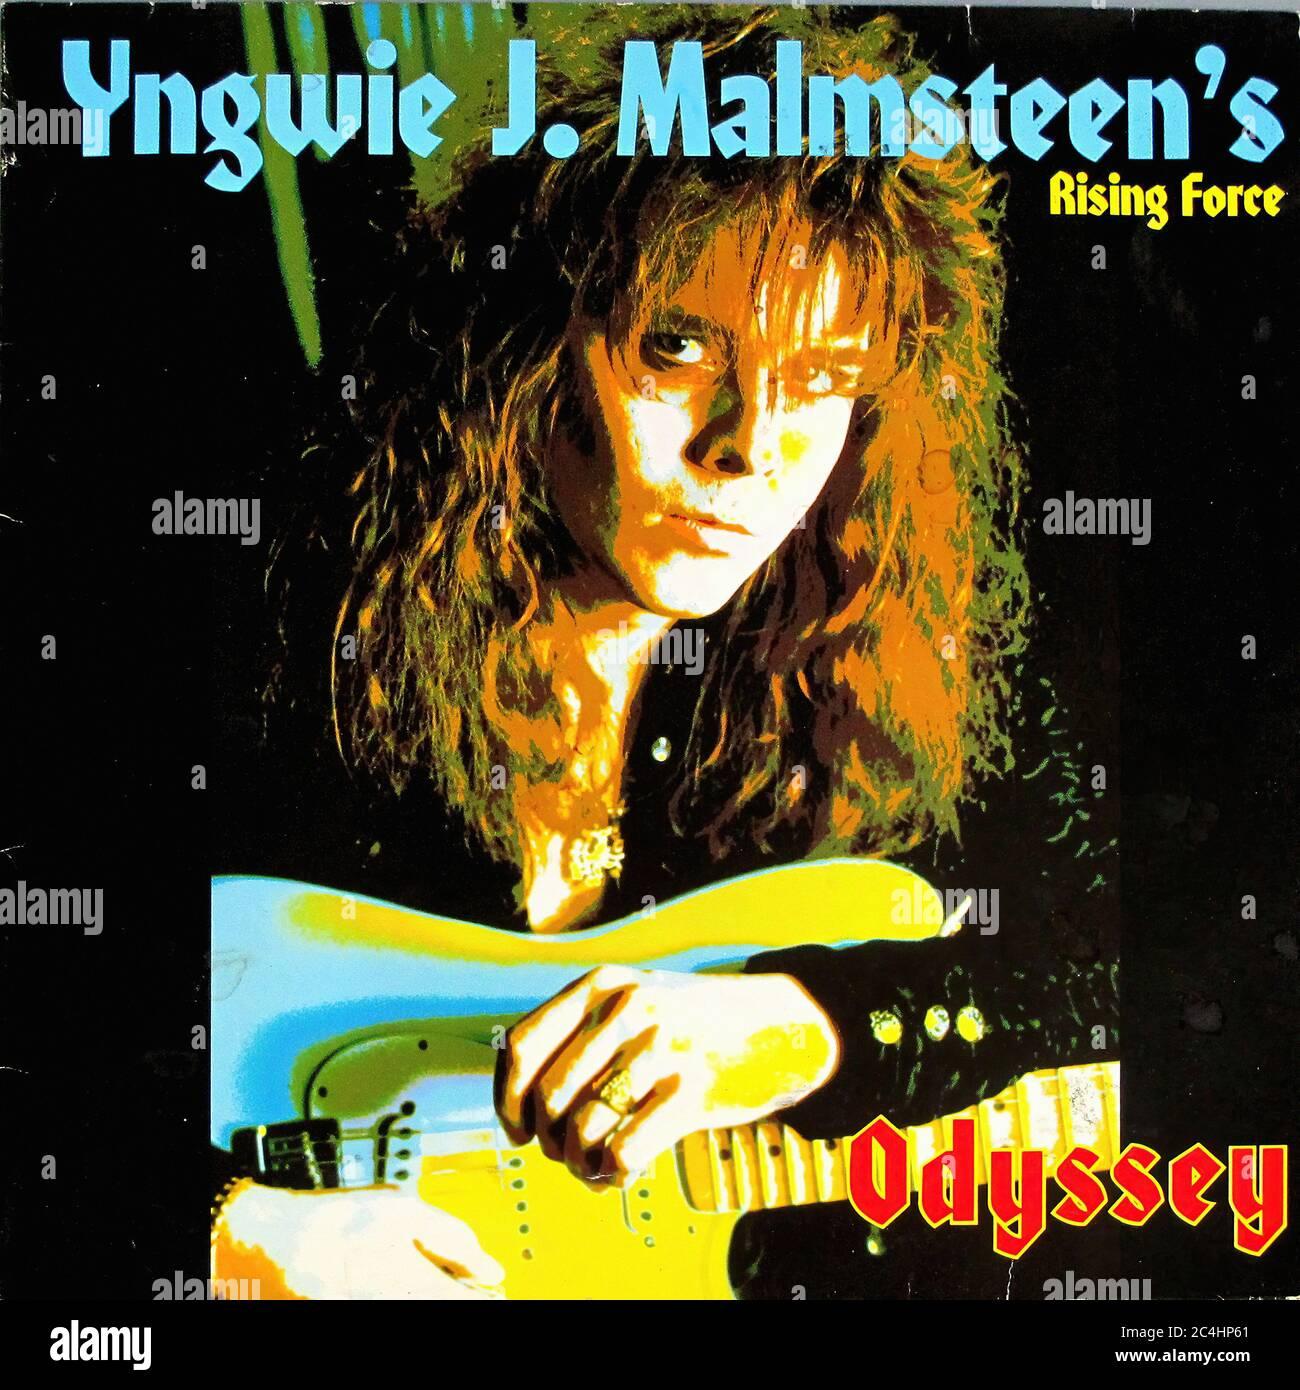 ¿Qué estáis escuchando ahora? Yngwie-j-malmsteen-rising-force-odyssey-12-lp-vinyl-vintage-record-cover-2C4HP61